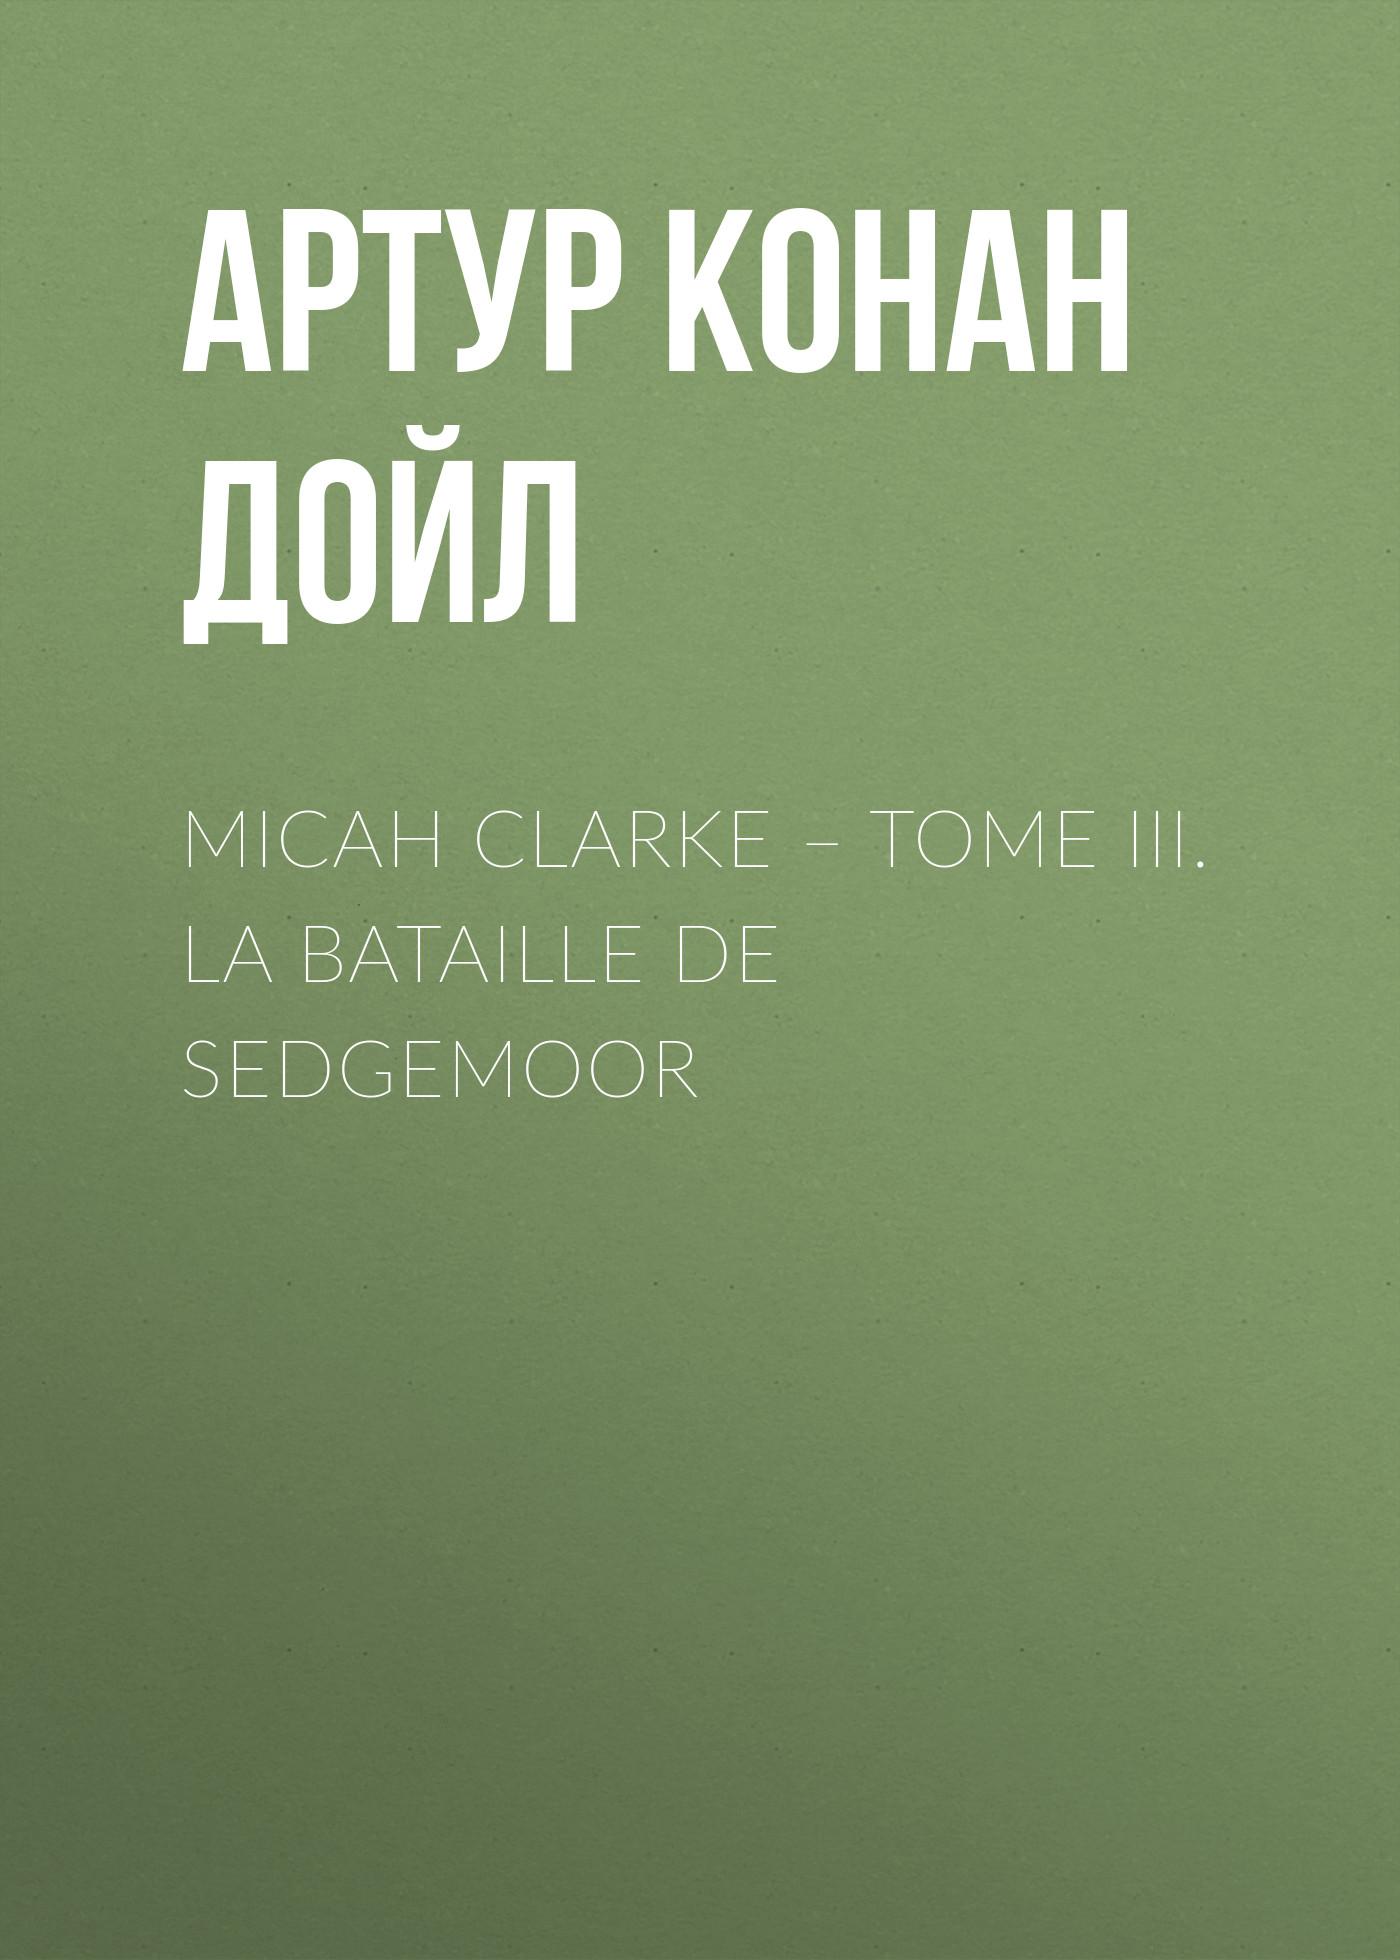 Артур Конан Дойл Micah Clarke – Tome III. La Bataille de Sedgemoor doyle a micah clarke ii